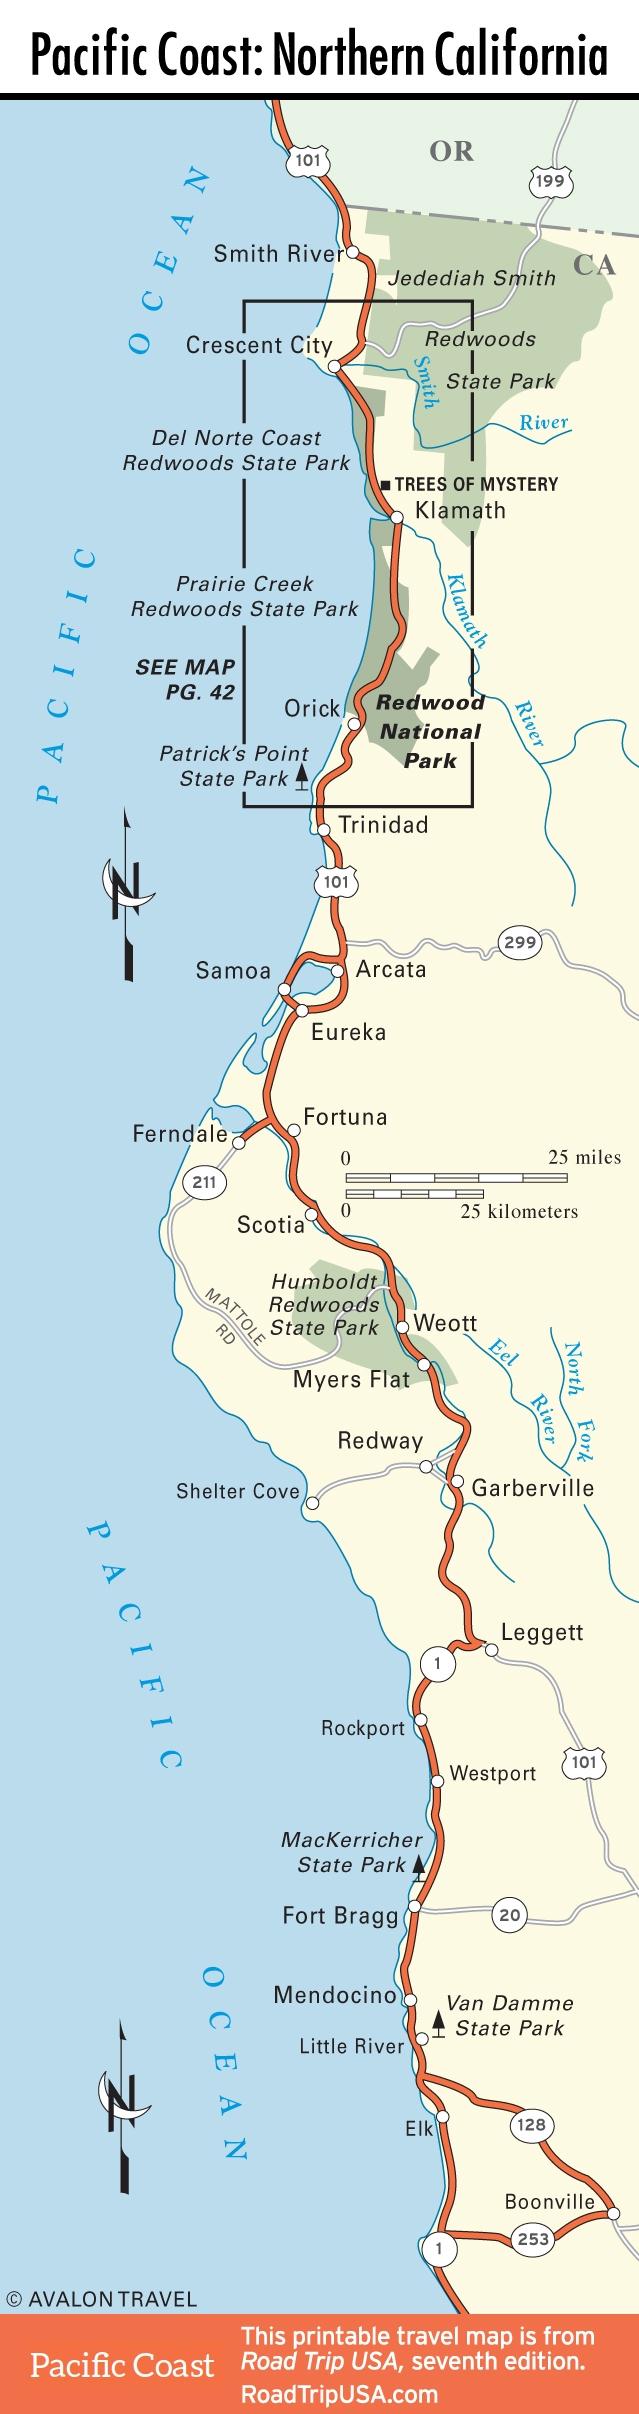 California National Parks Map - Klipy - Northern California National Parks Map